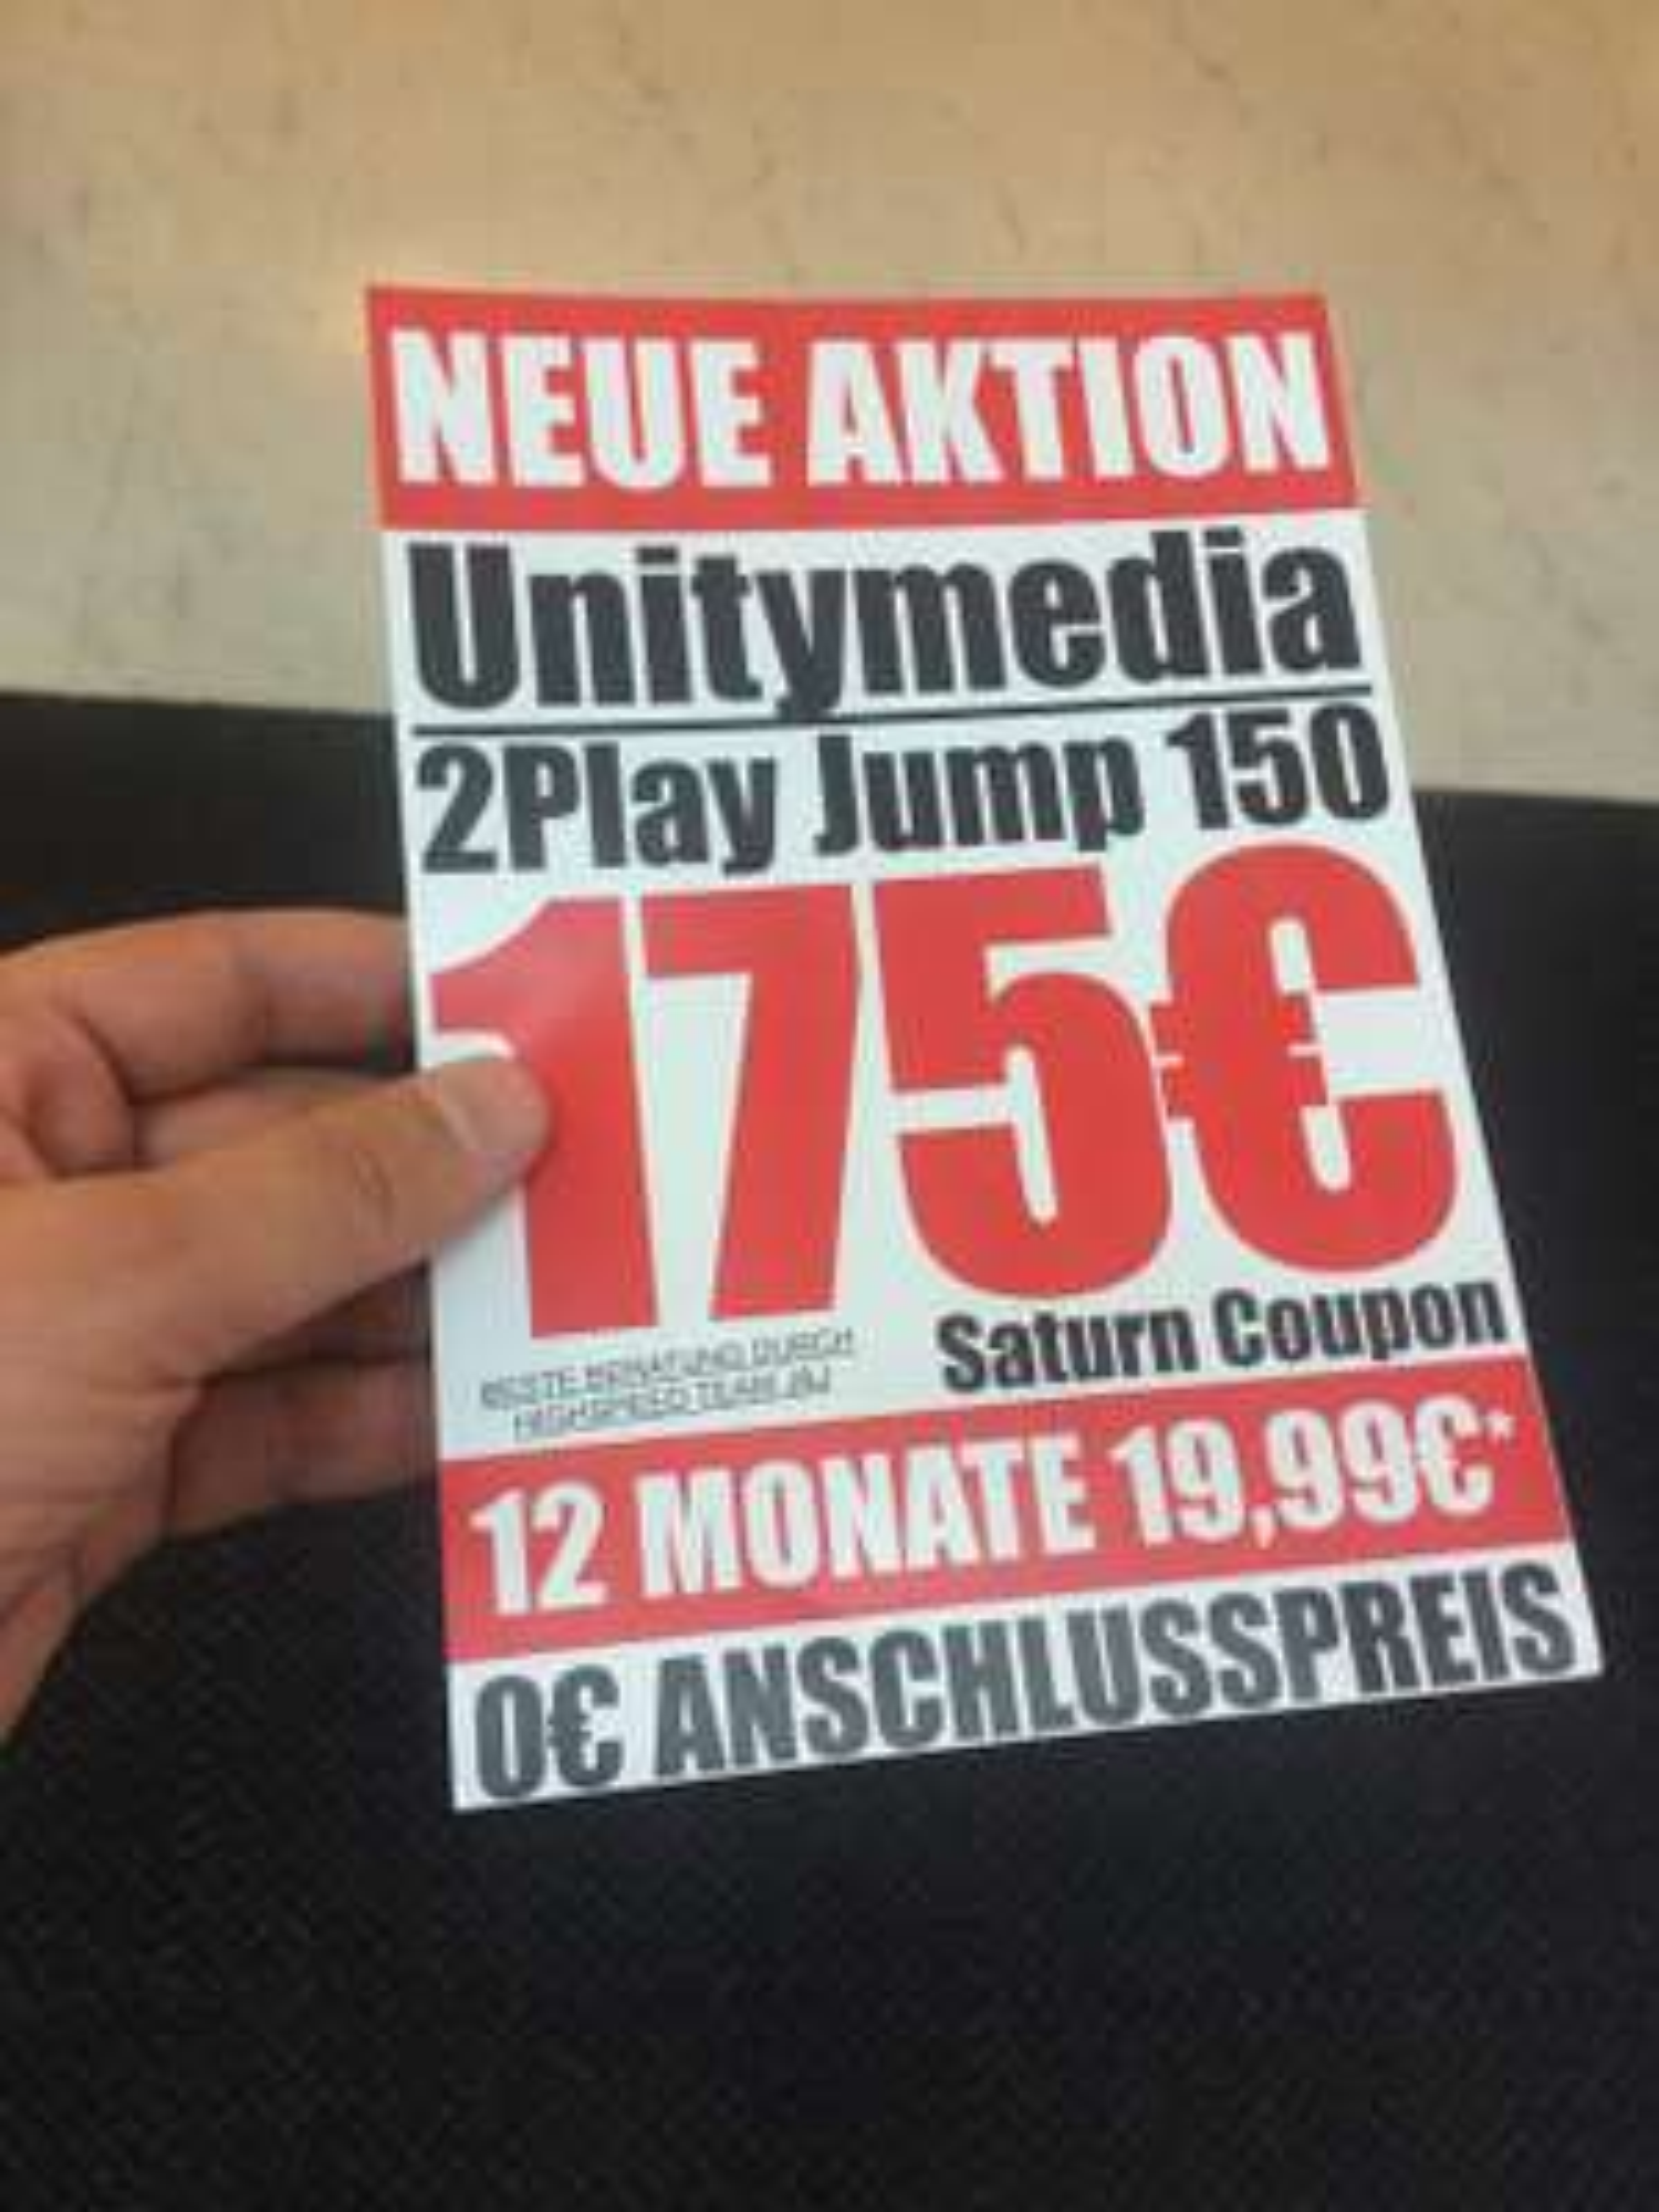 Unitymedia Aktion - 0€ Anschlusspreis und 175€ Saturn Coupon - 12 Monate 19,99€ - 2Play Jump 150 (Lokal)